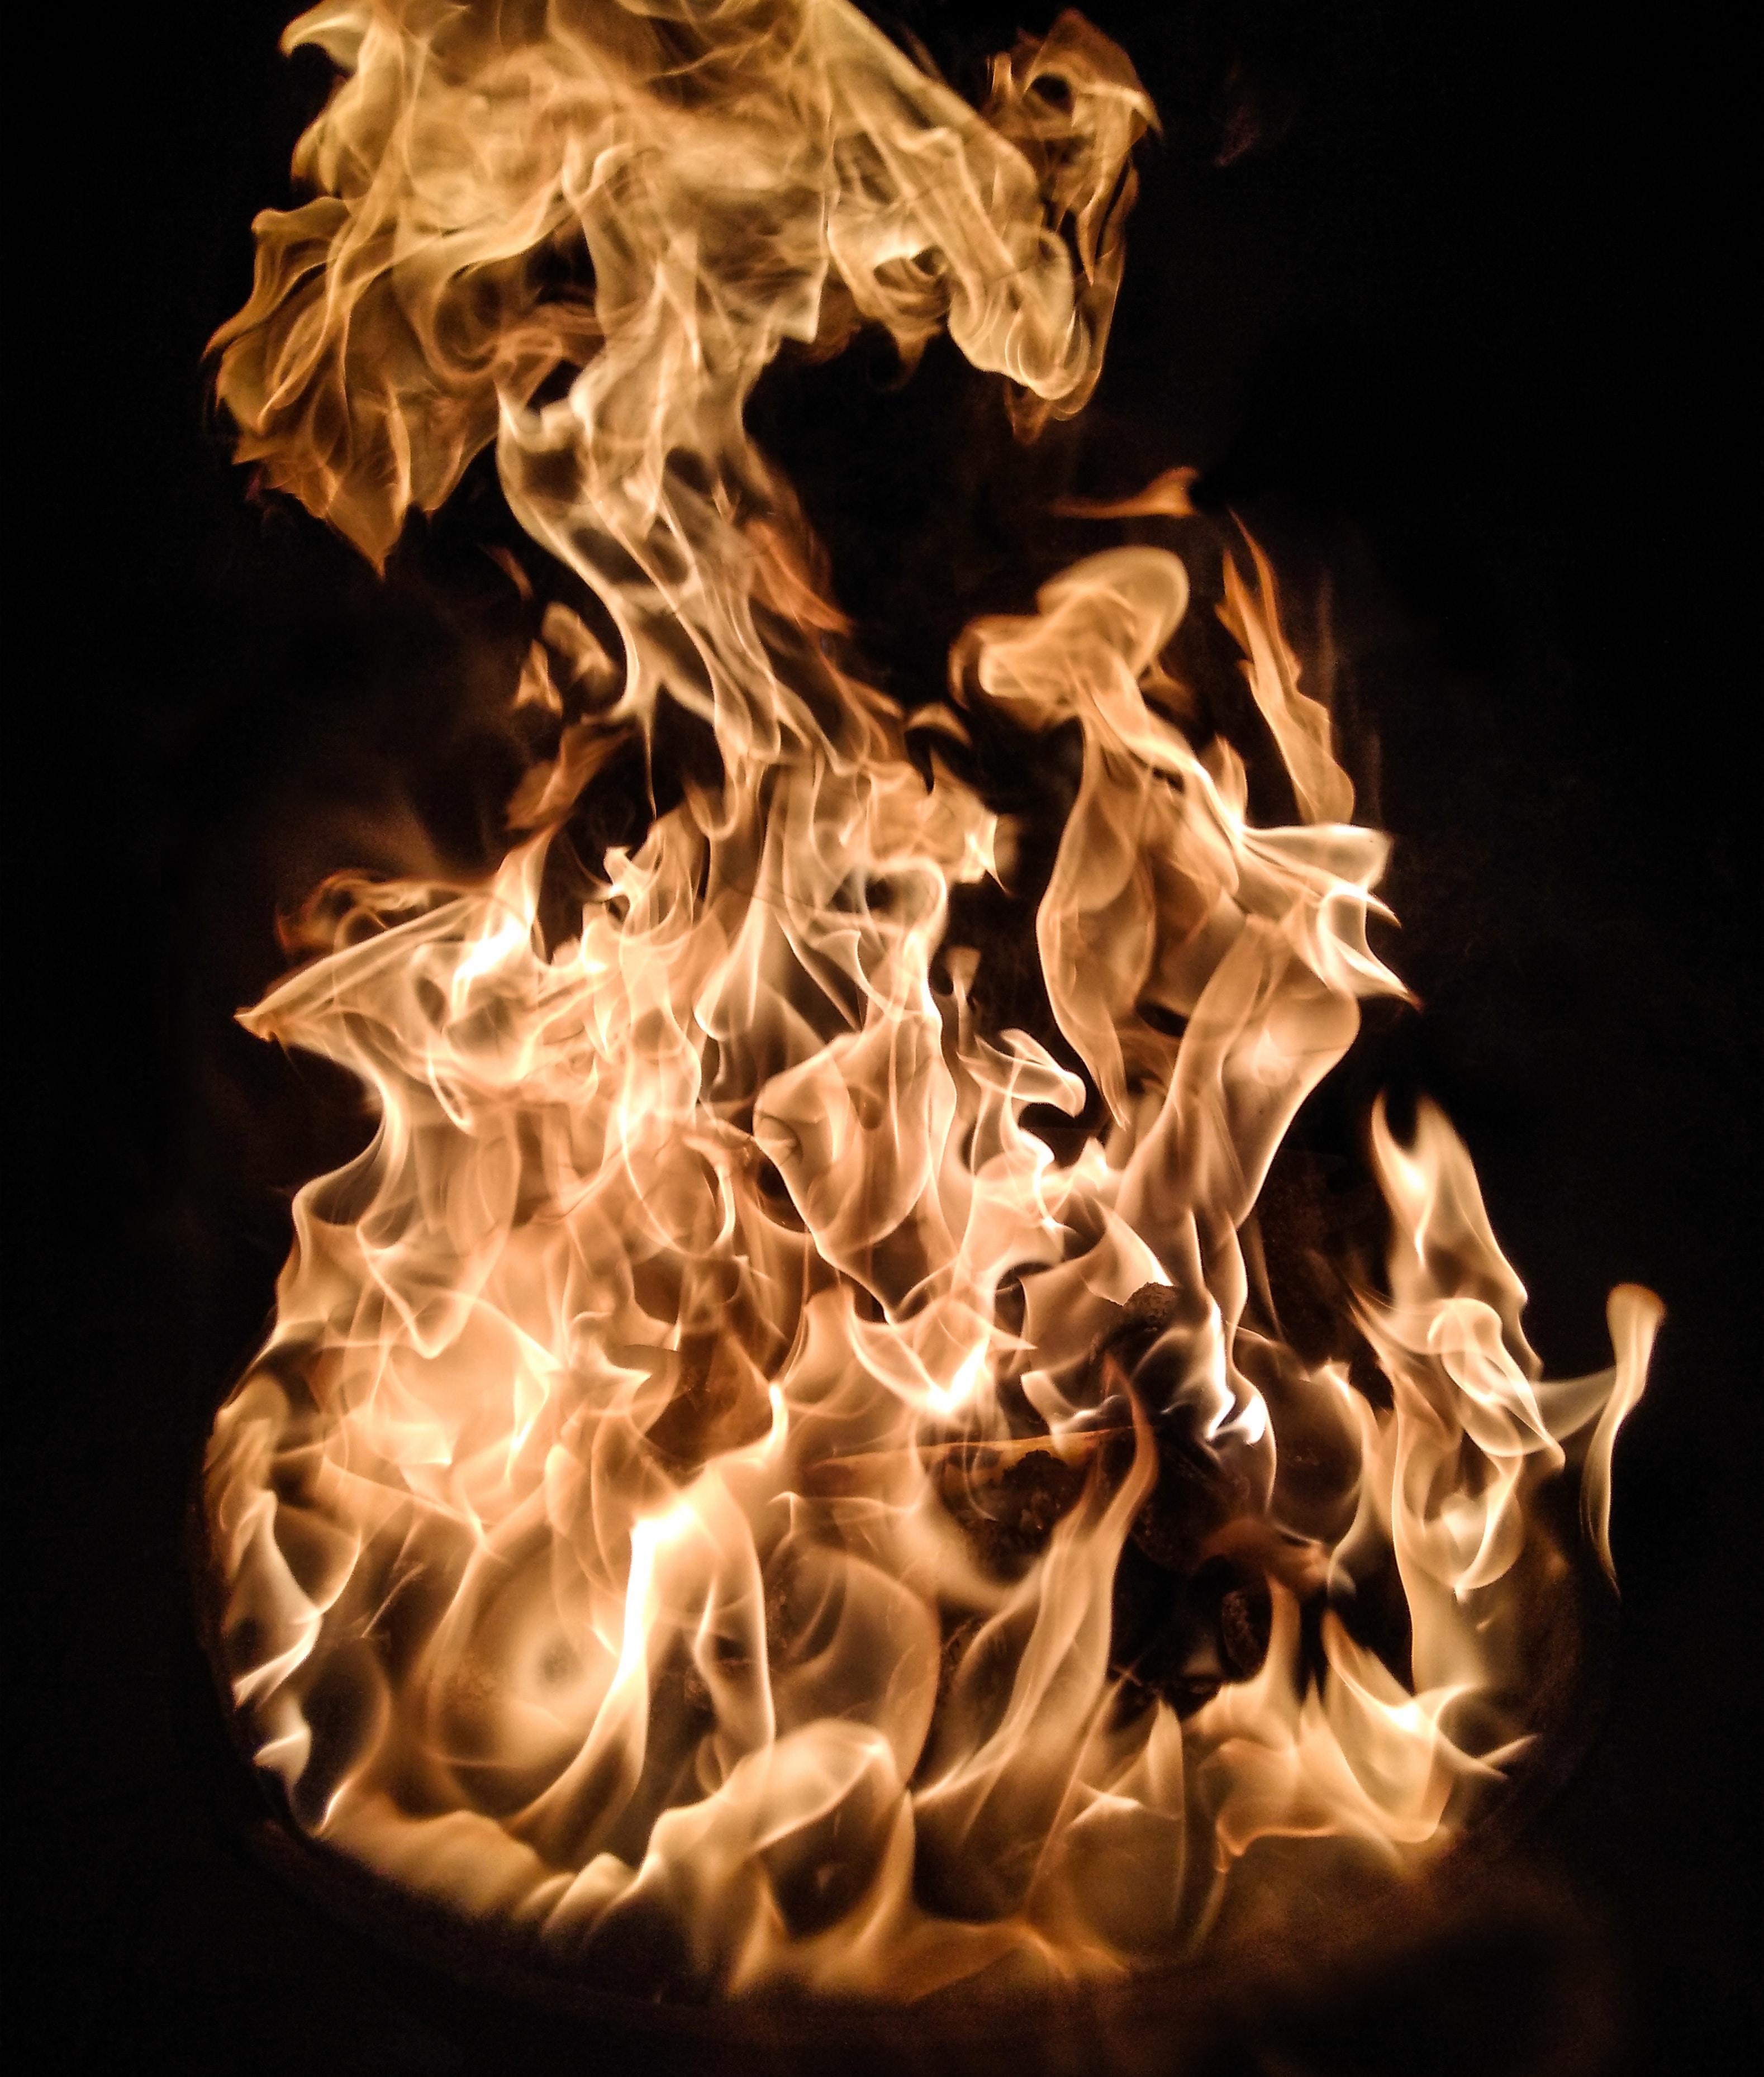 orange flame on black background